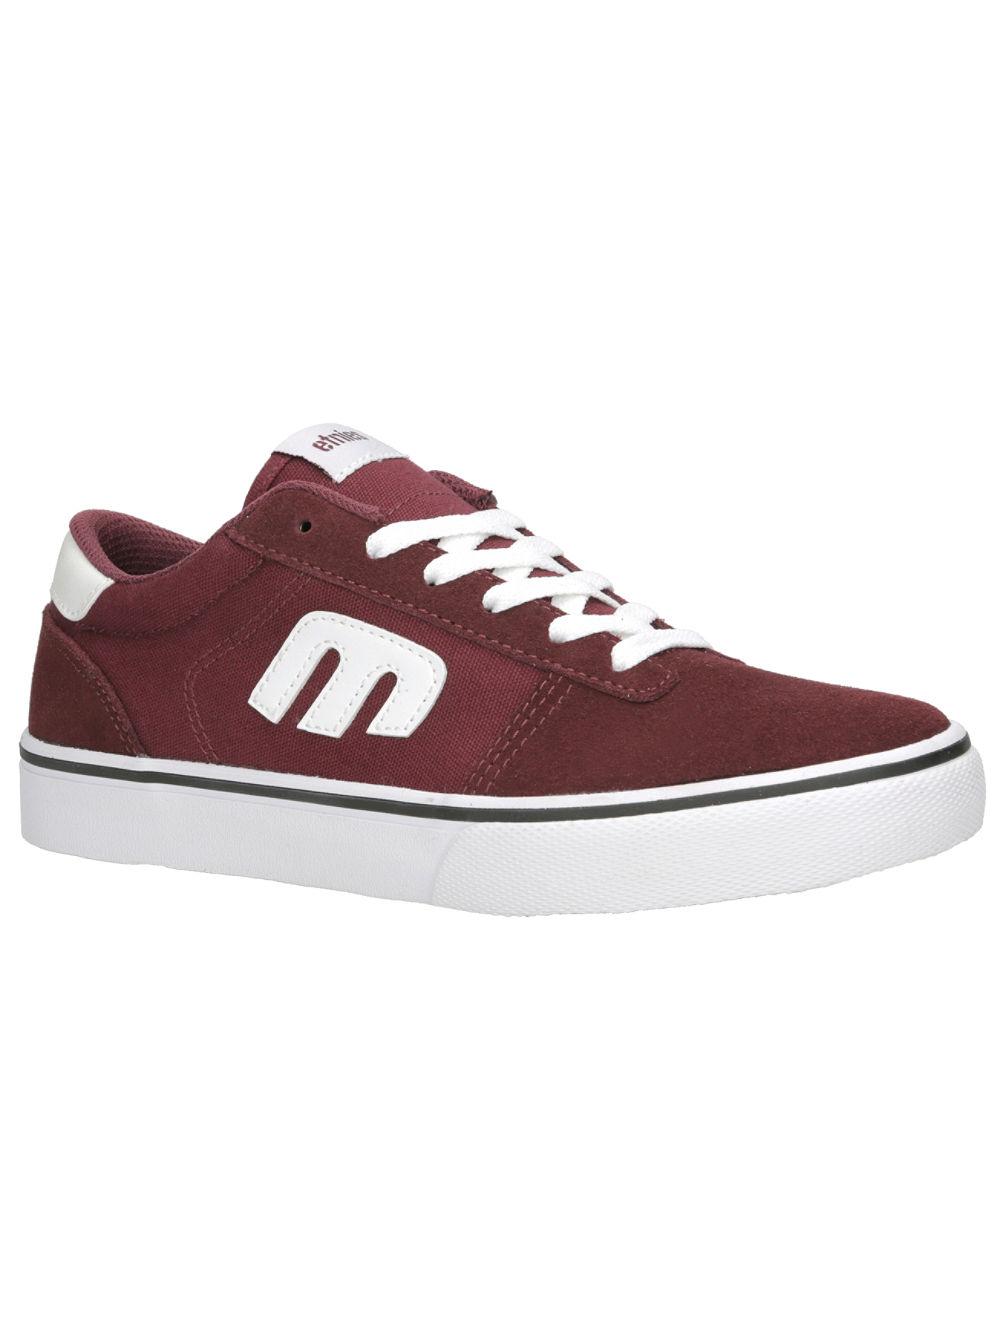 Calli-Vulc Skate Shoes